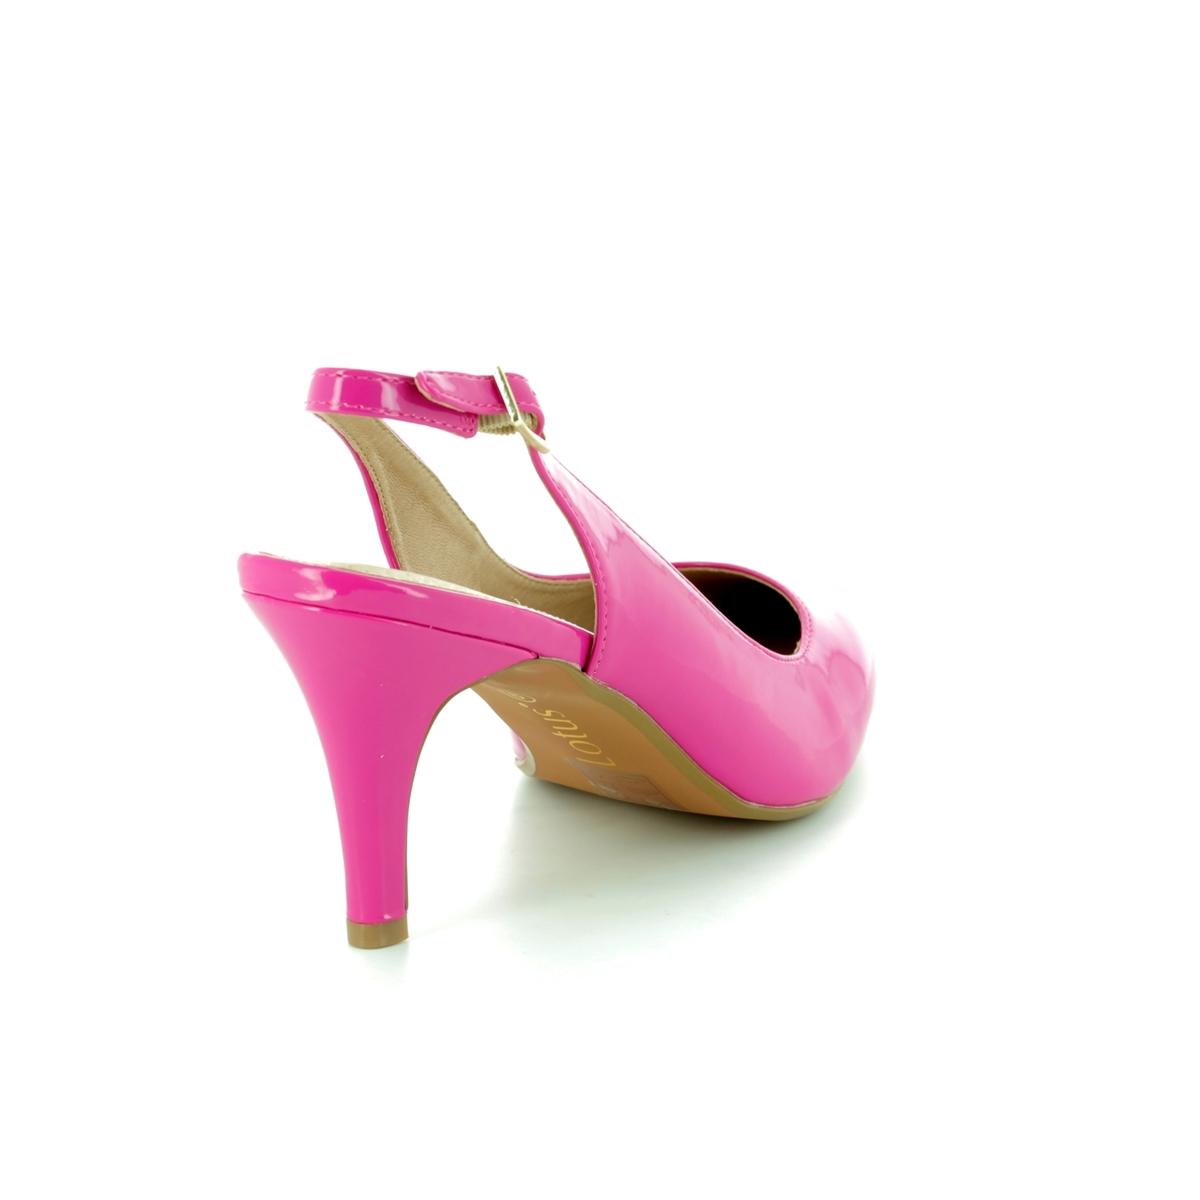 bd3bd3646486 Yasmine Fuchsia High Platform Heels Source · Lotus Nadia Fuchsia high  heeled shoes